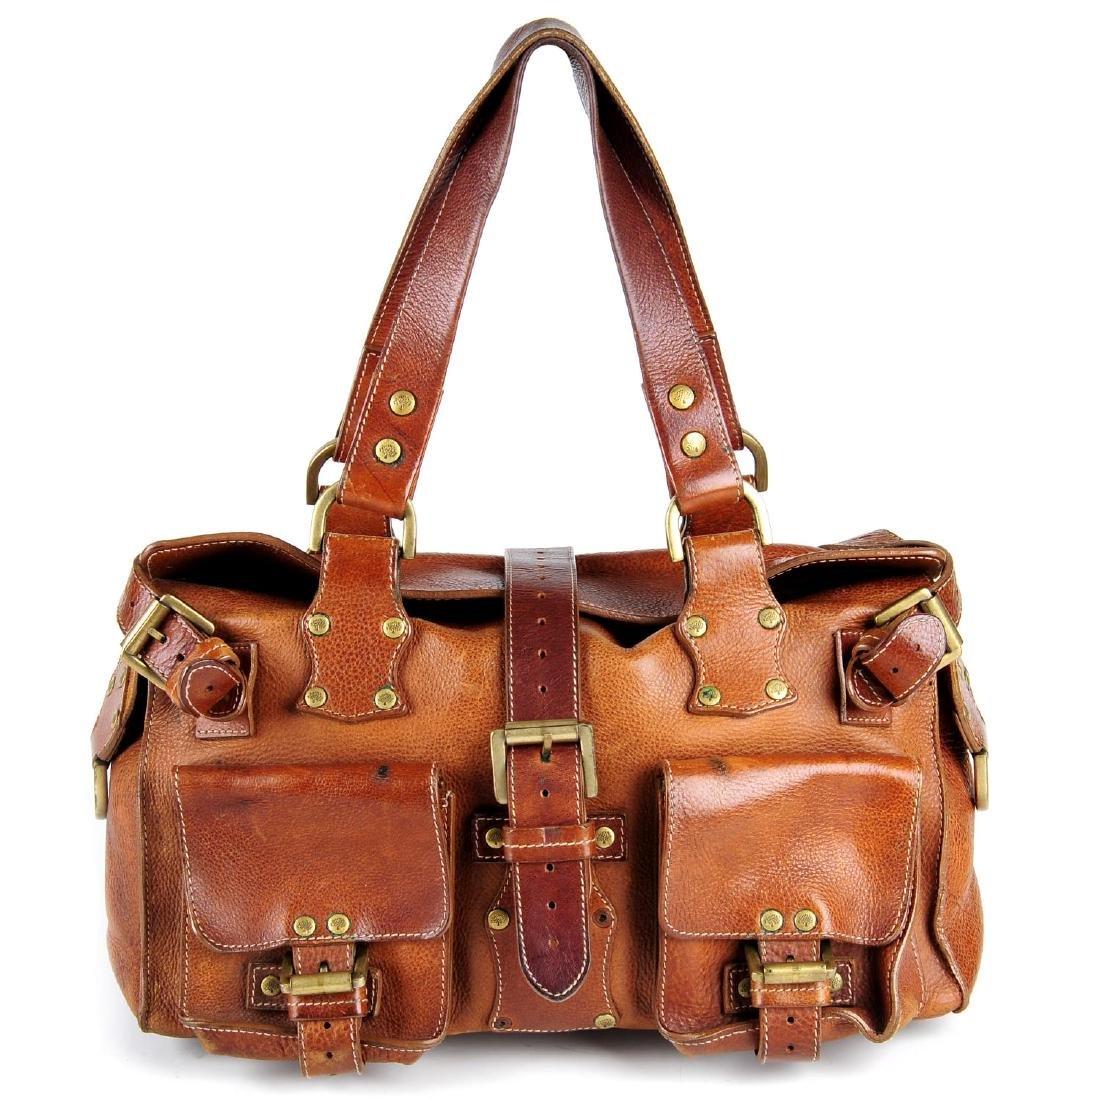 MULBERRY - an oak leather Roxanne handbag. With dual